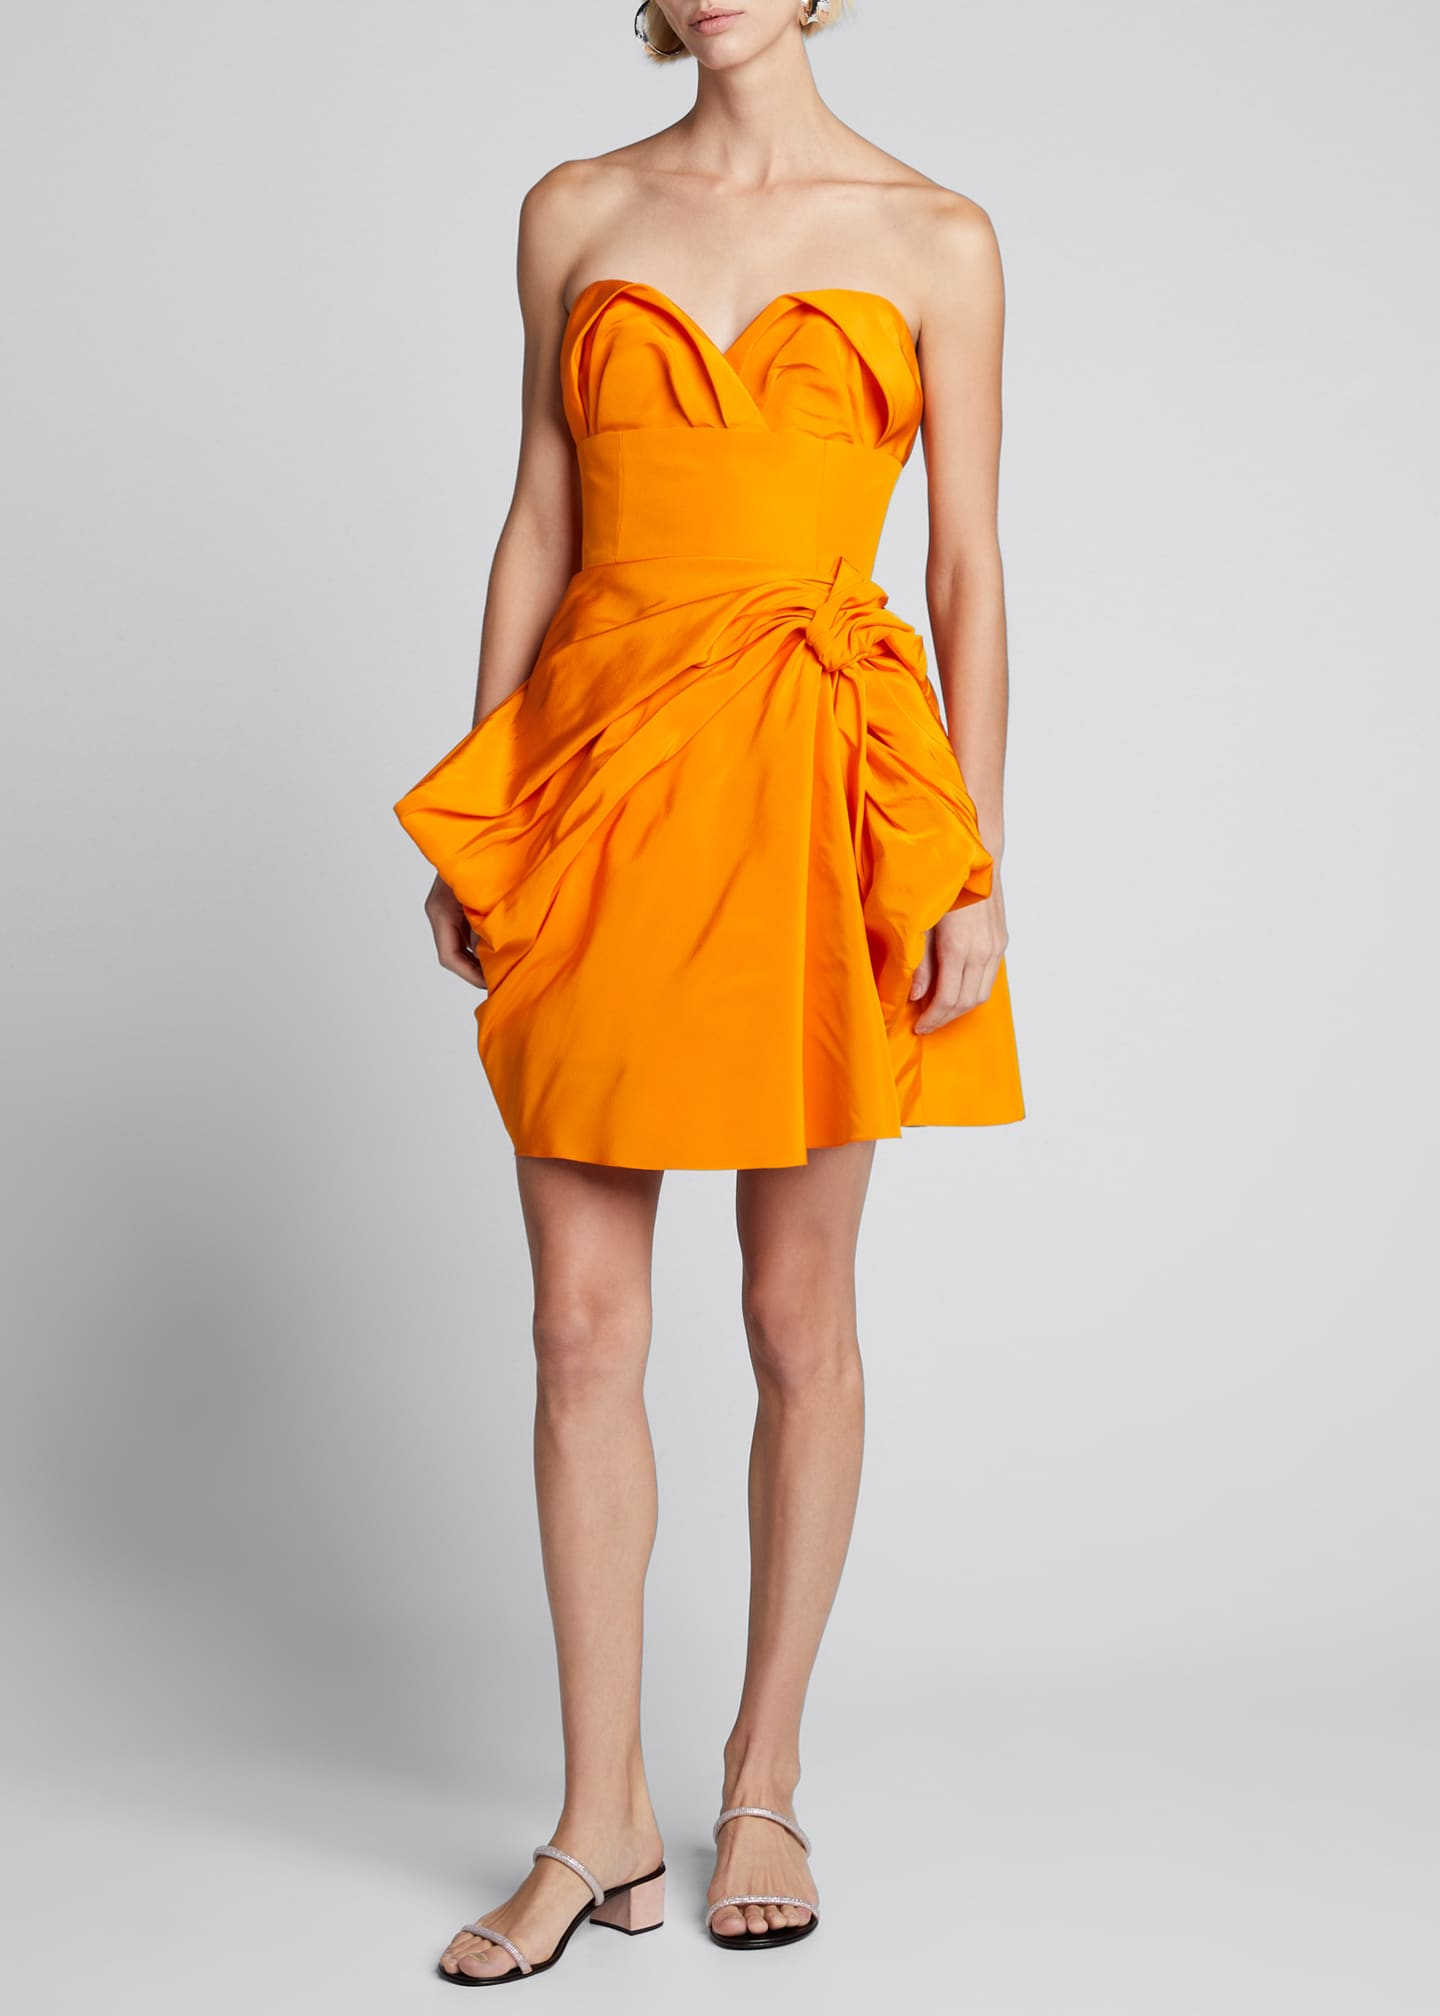 Carolina Herrera Strapless Sweetheart Bowed Silk Mini Dress